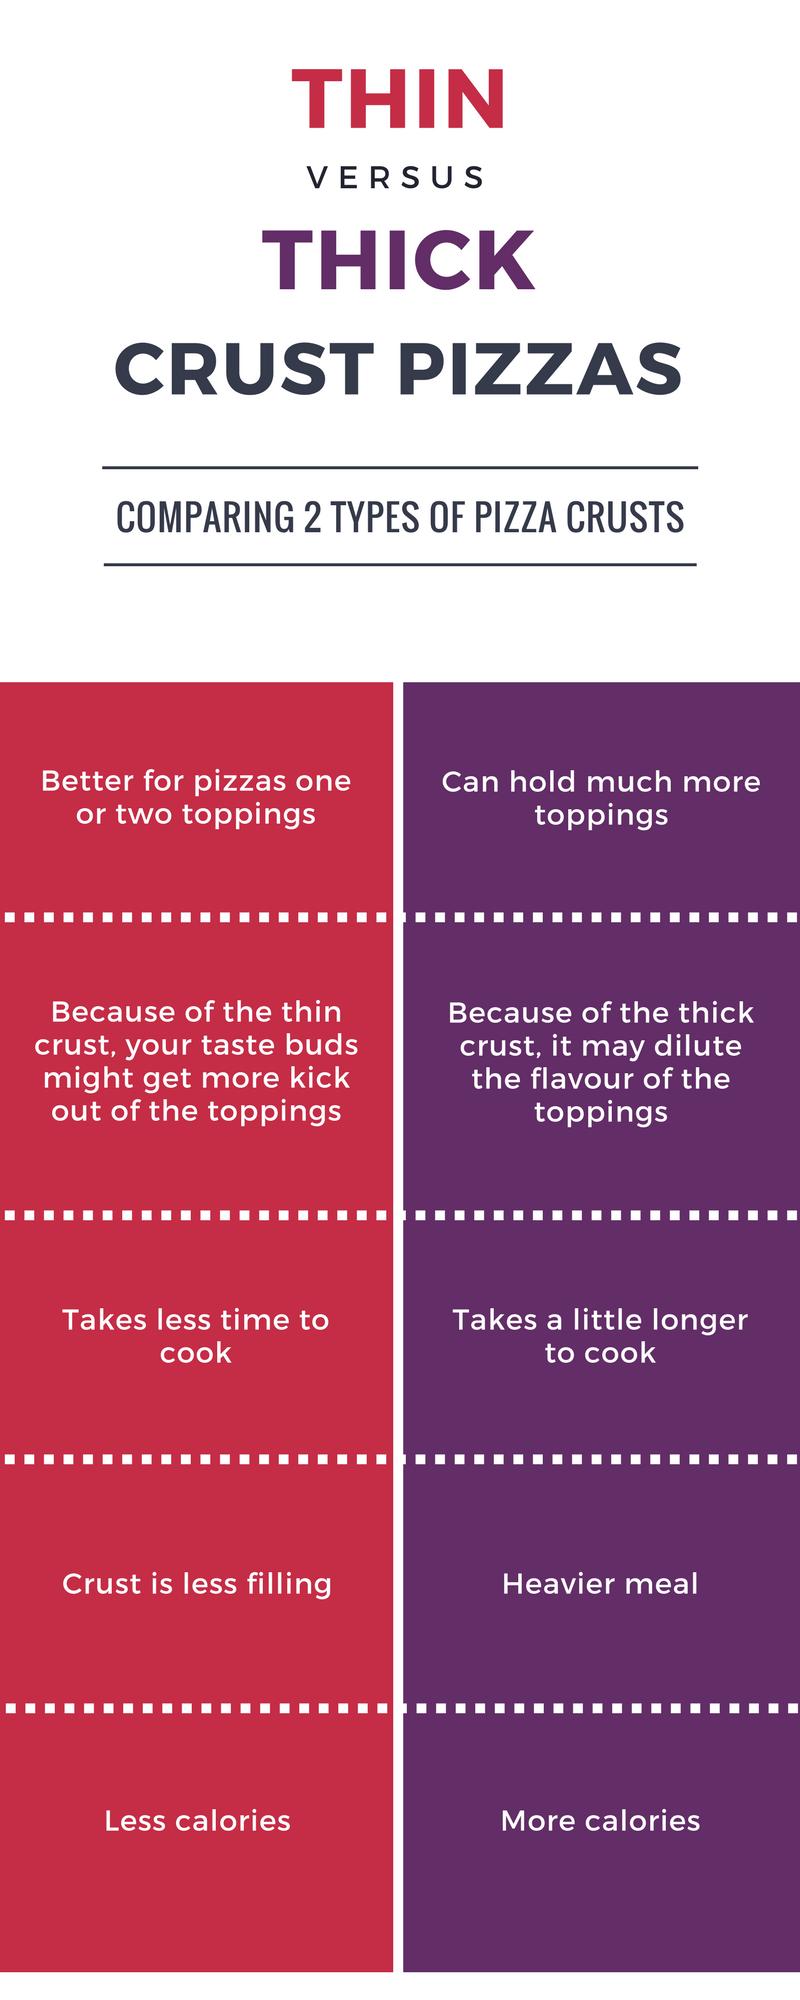 Thin Crust Pizza Vs Thick Crust Pizza